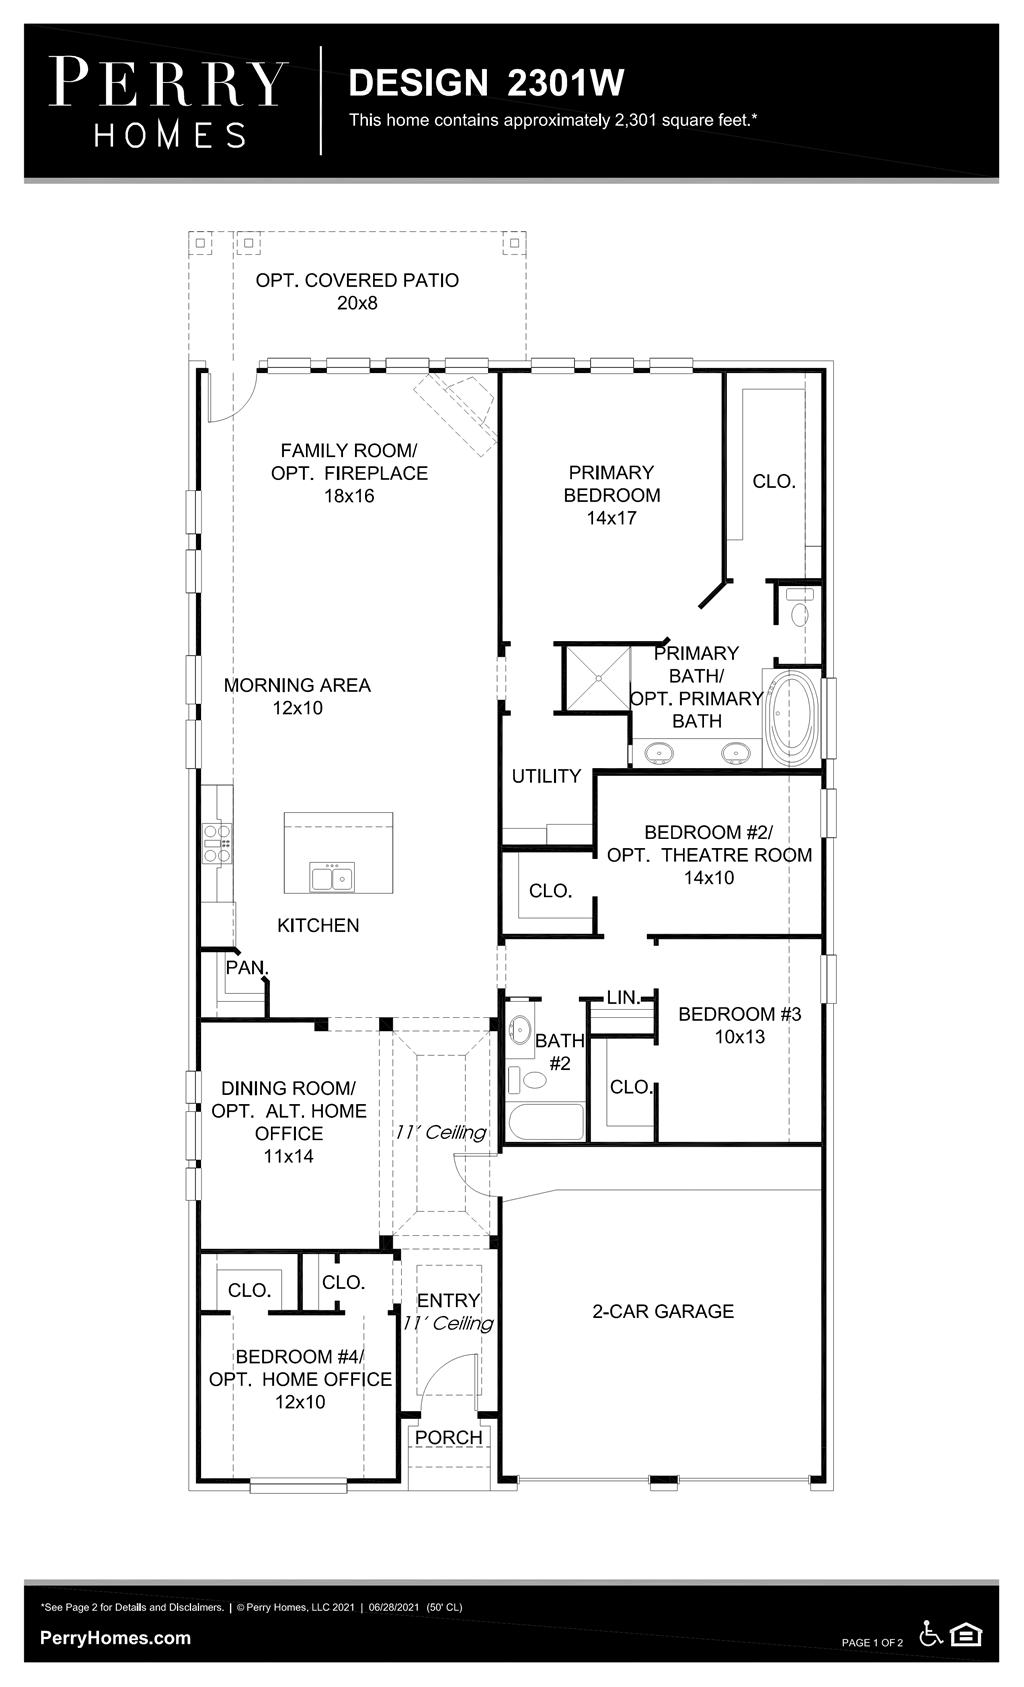 Floor Plan for 2301W